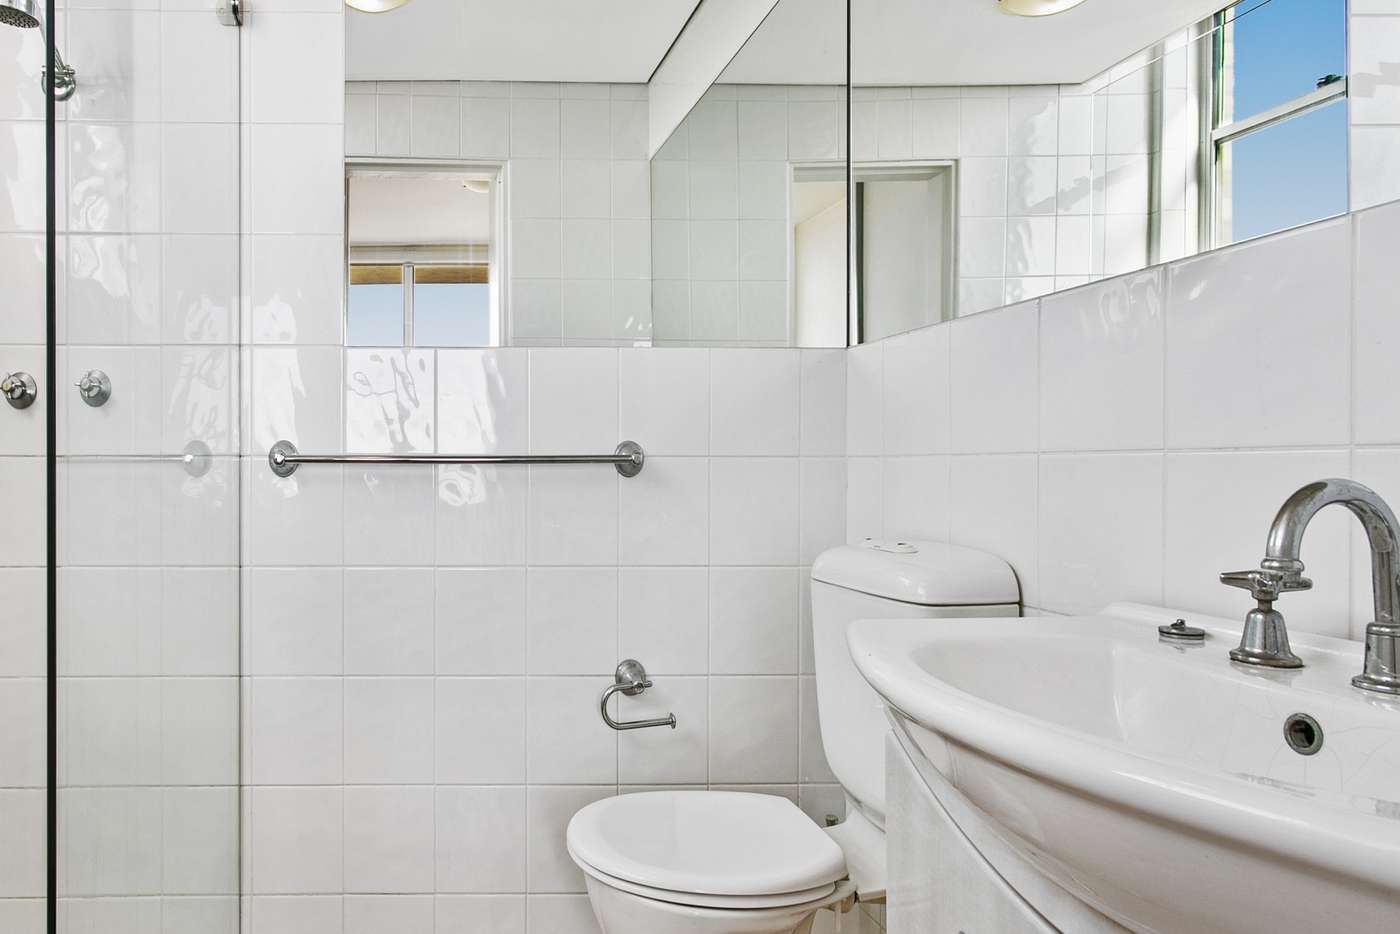 Seventh view of Homely apartment listing, 60/22 Mosman Street, Mosman NSW 2088